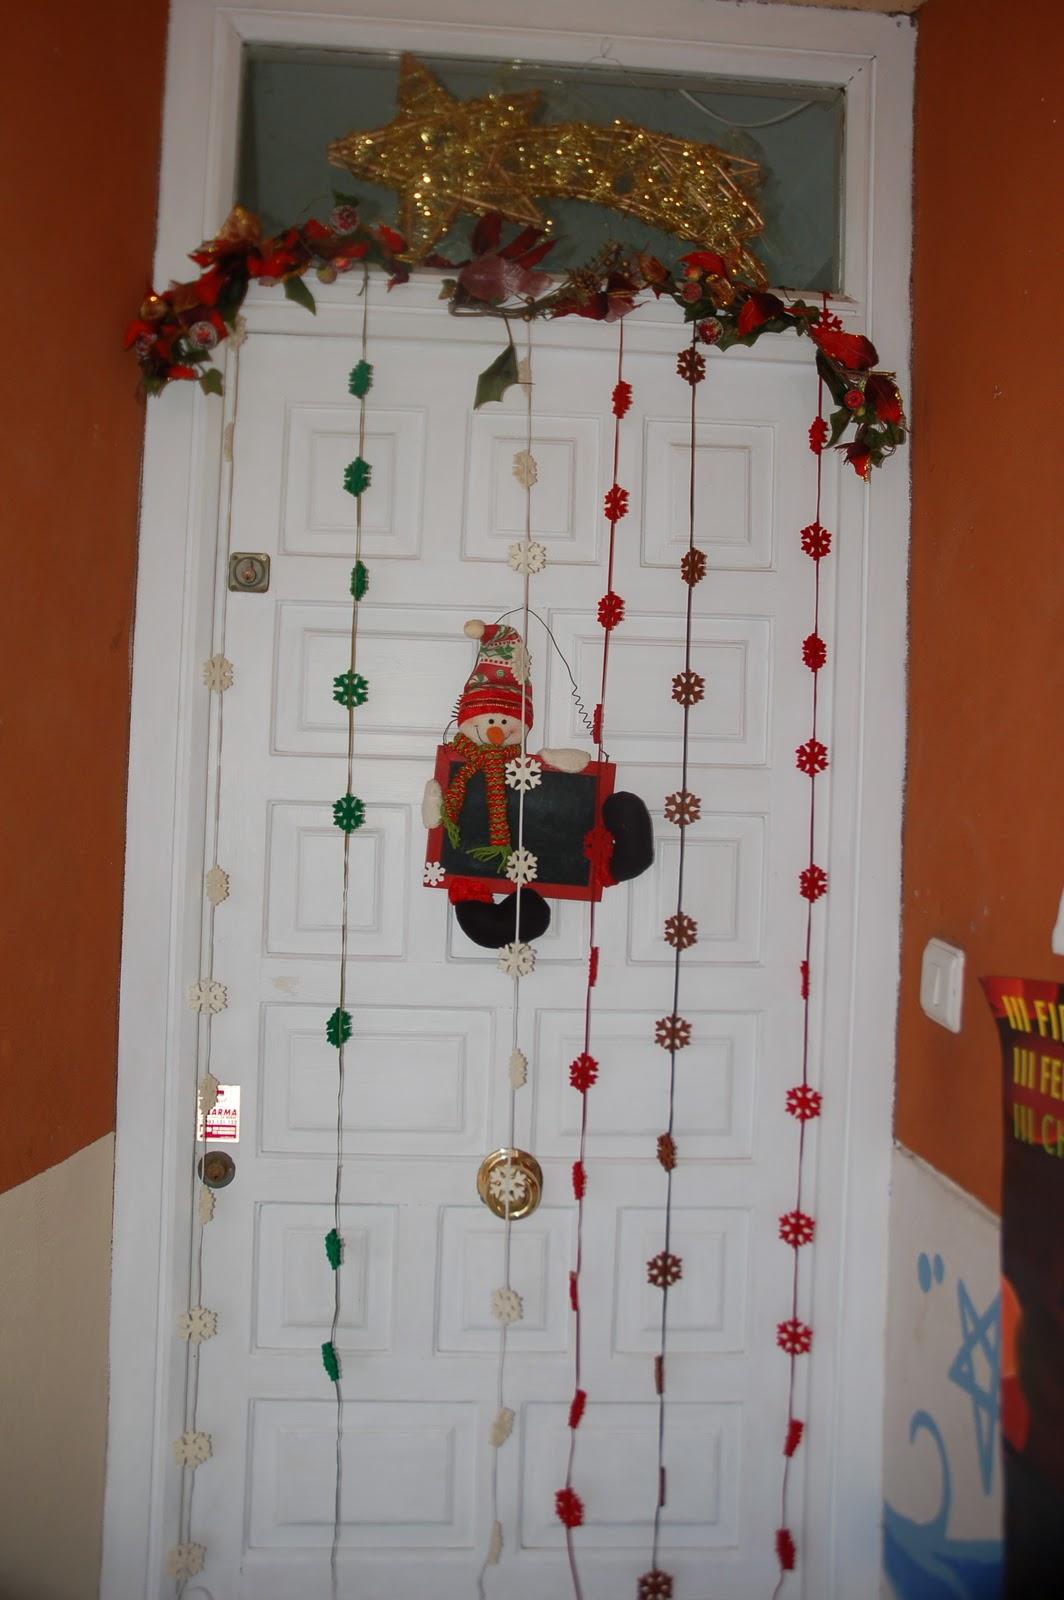 Decoraci n navide a en luna lola for Decoracion de adornos navidenos